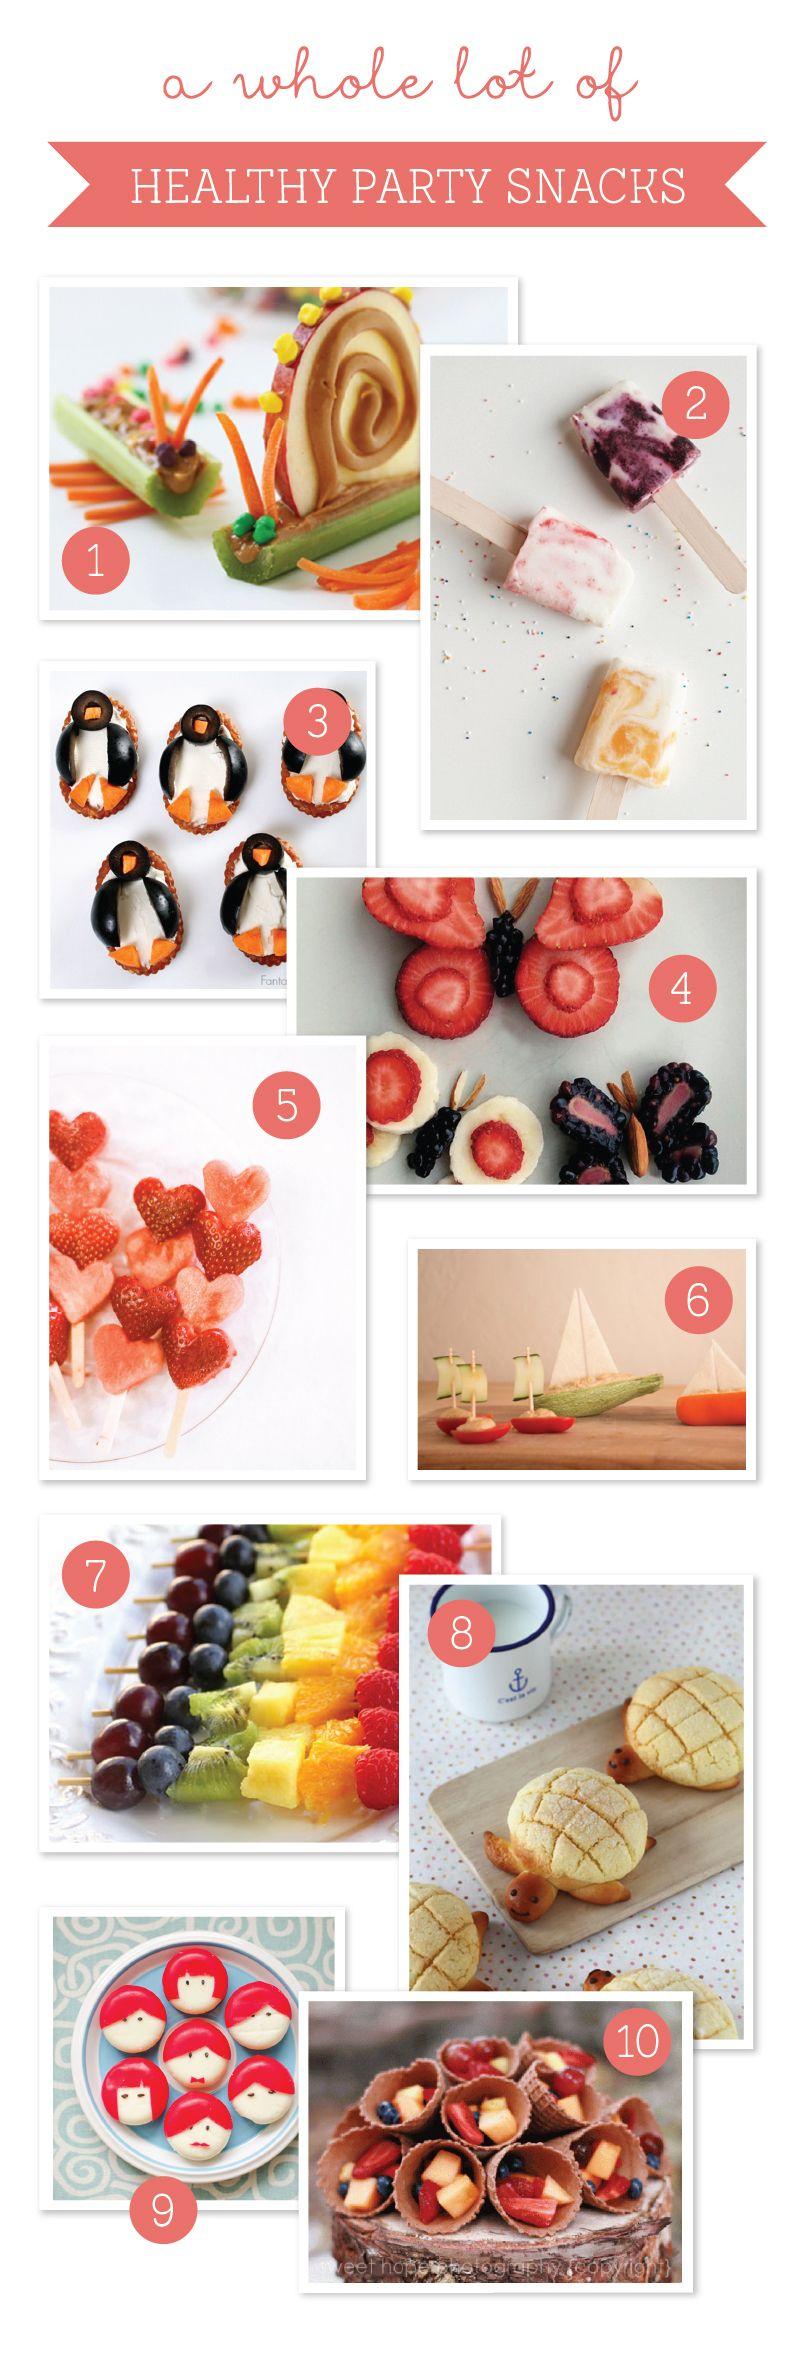 10 Delicious & Nutritious Party Snacks Healthy party